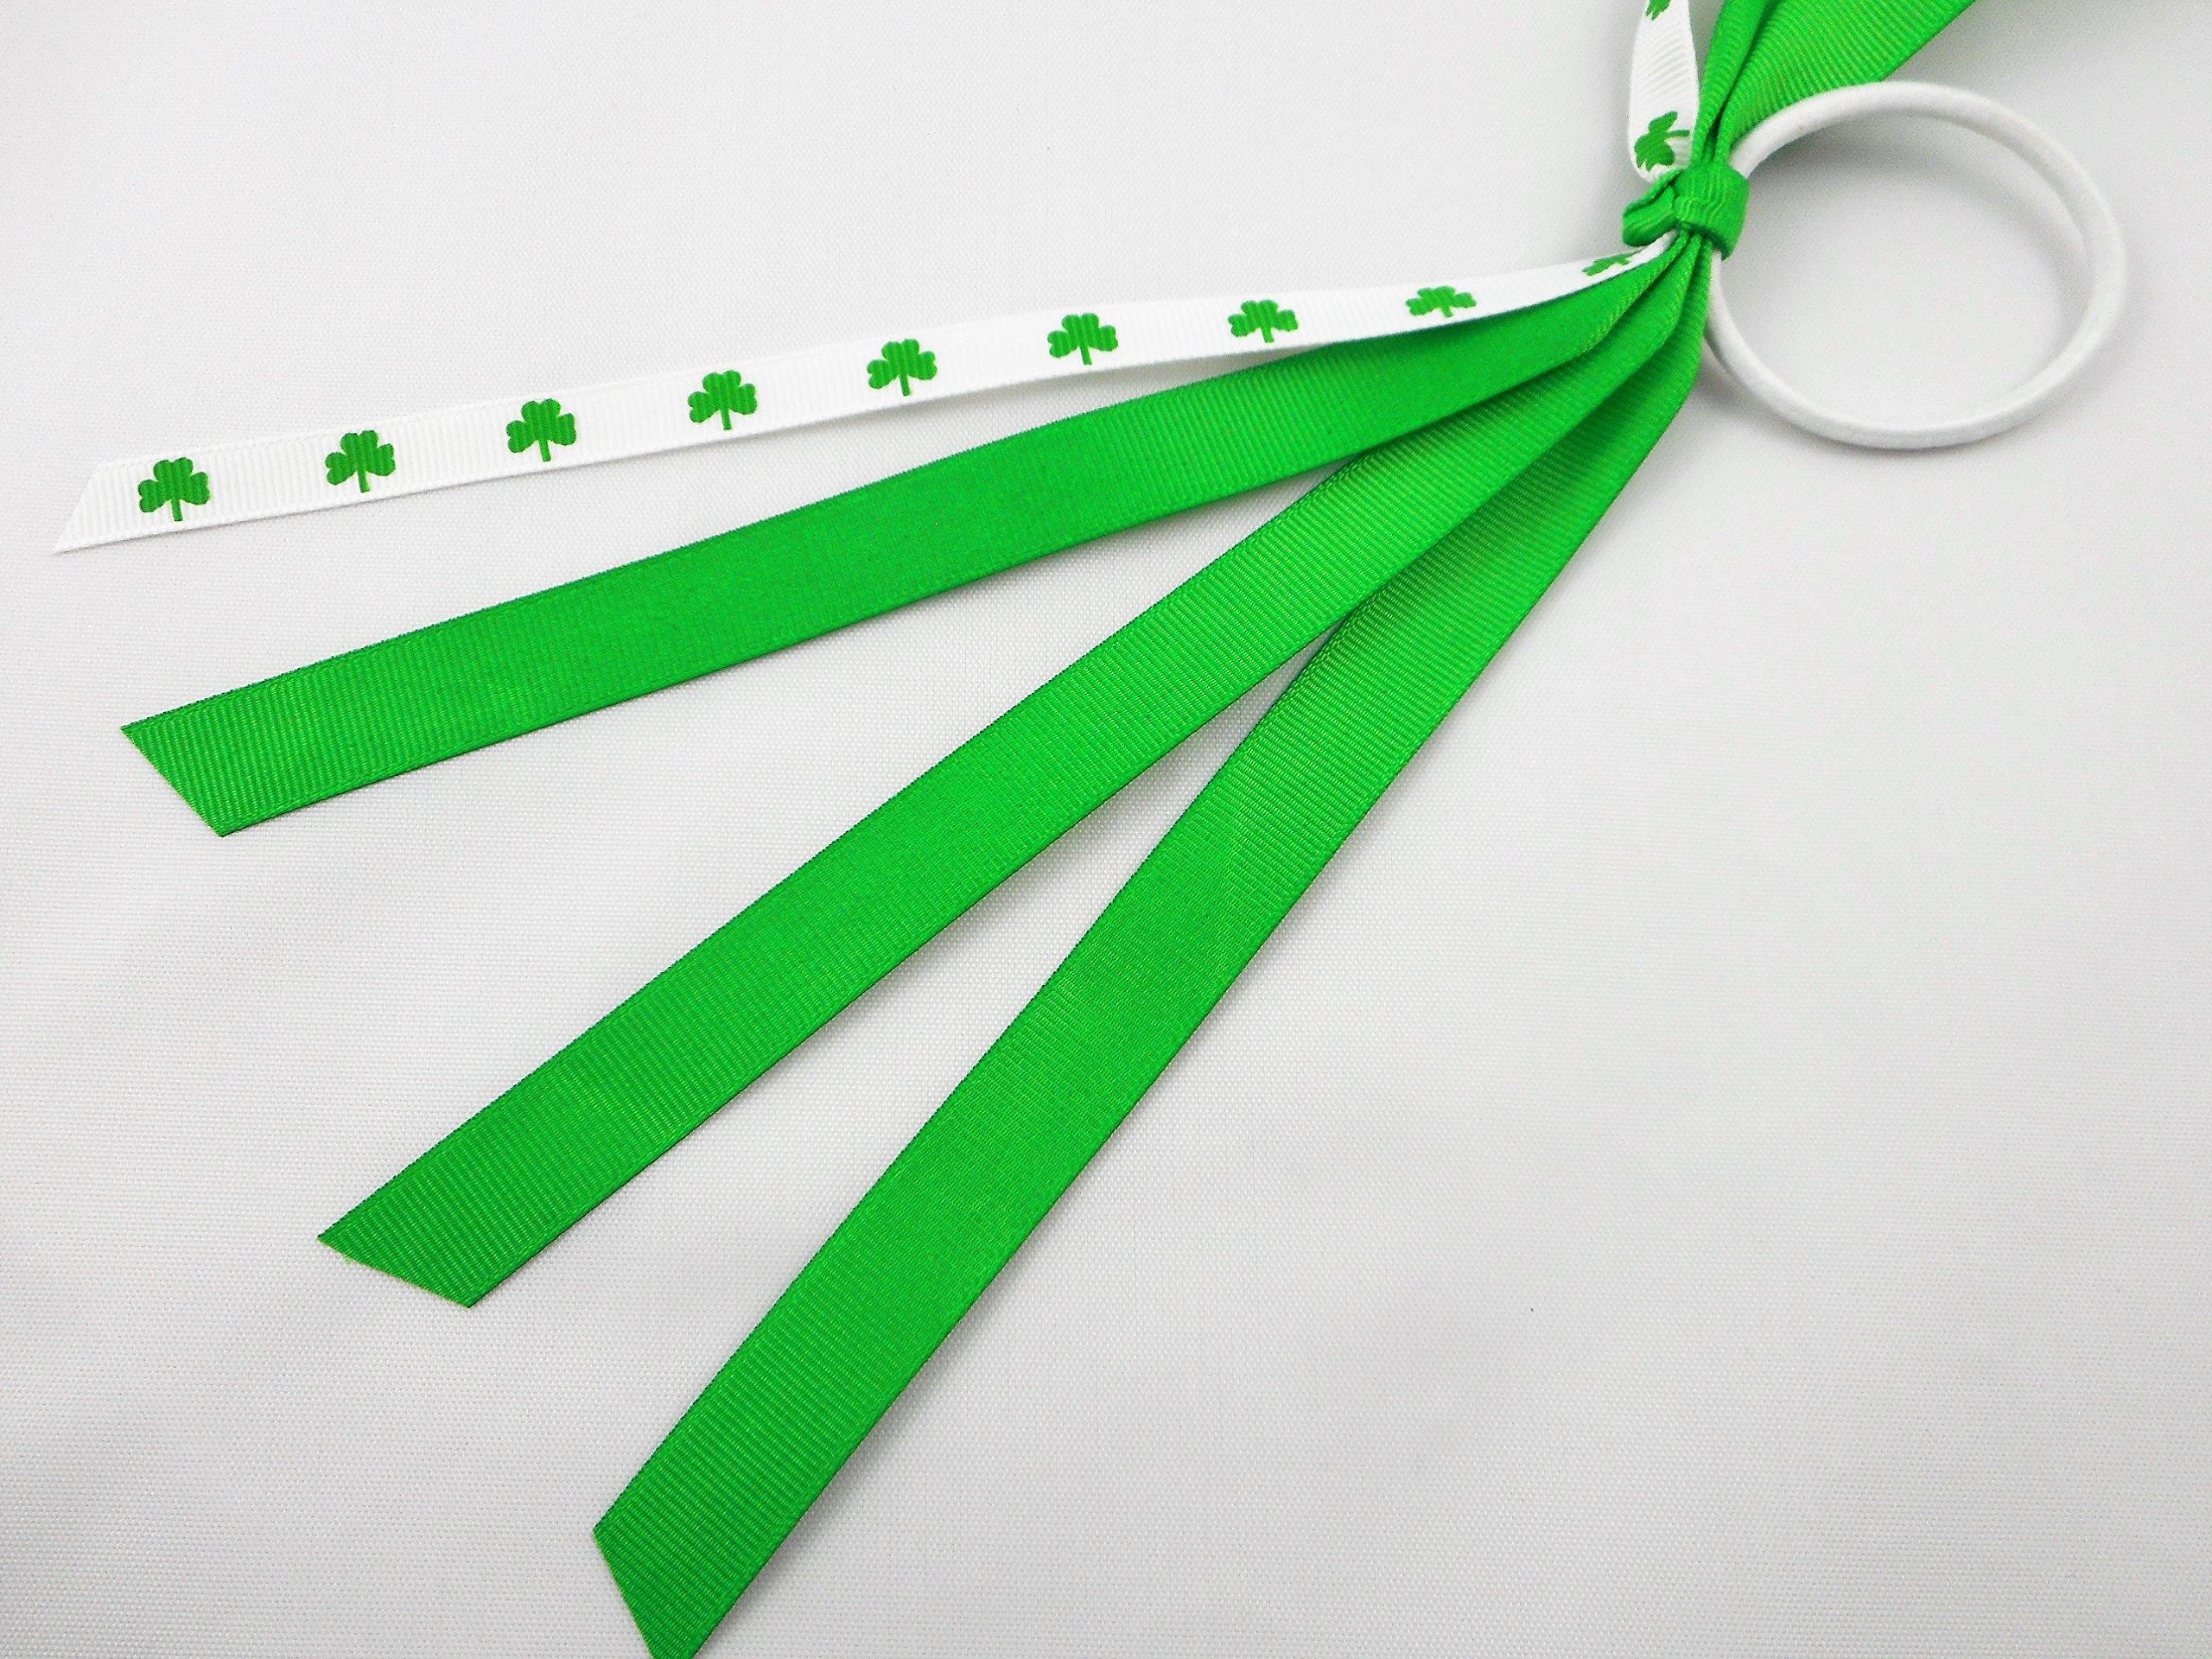 Shamrock Pony Ribbons, Hair Ties, Pony Ribbon Streamers, Pony Tail Holder by Missy Moo Designs